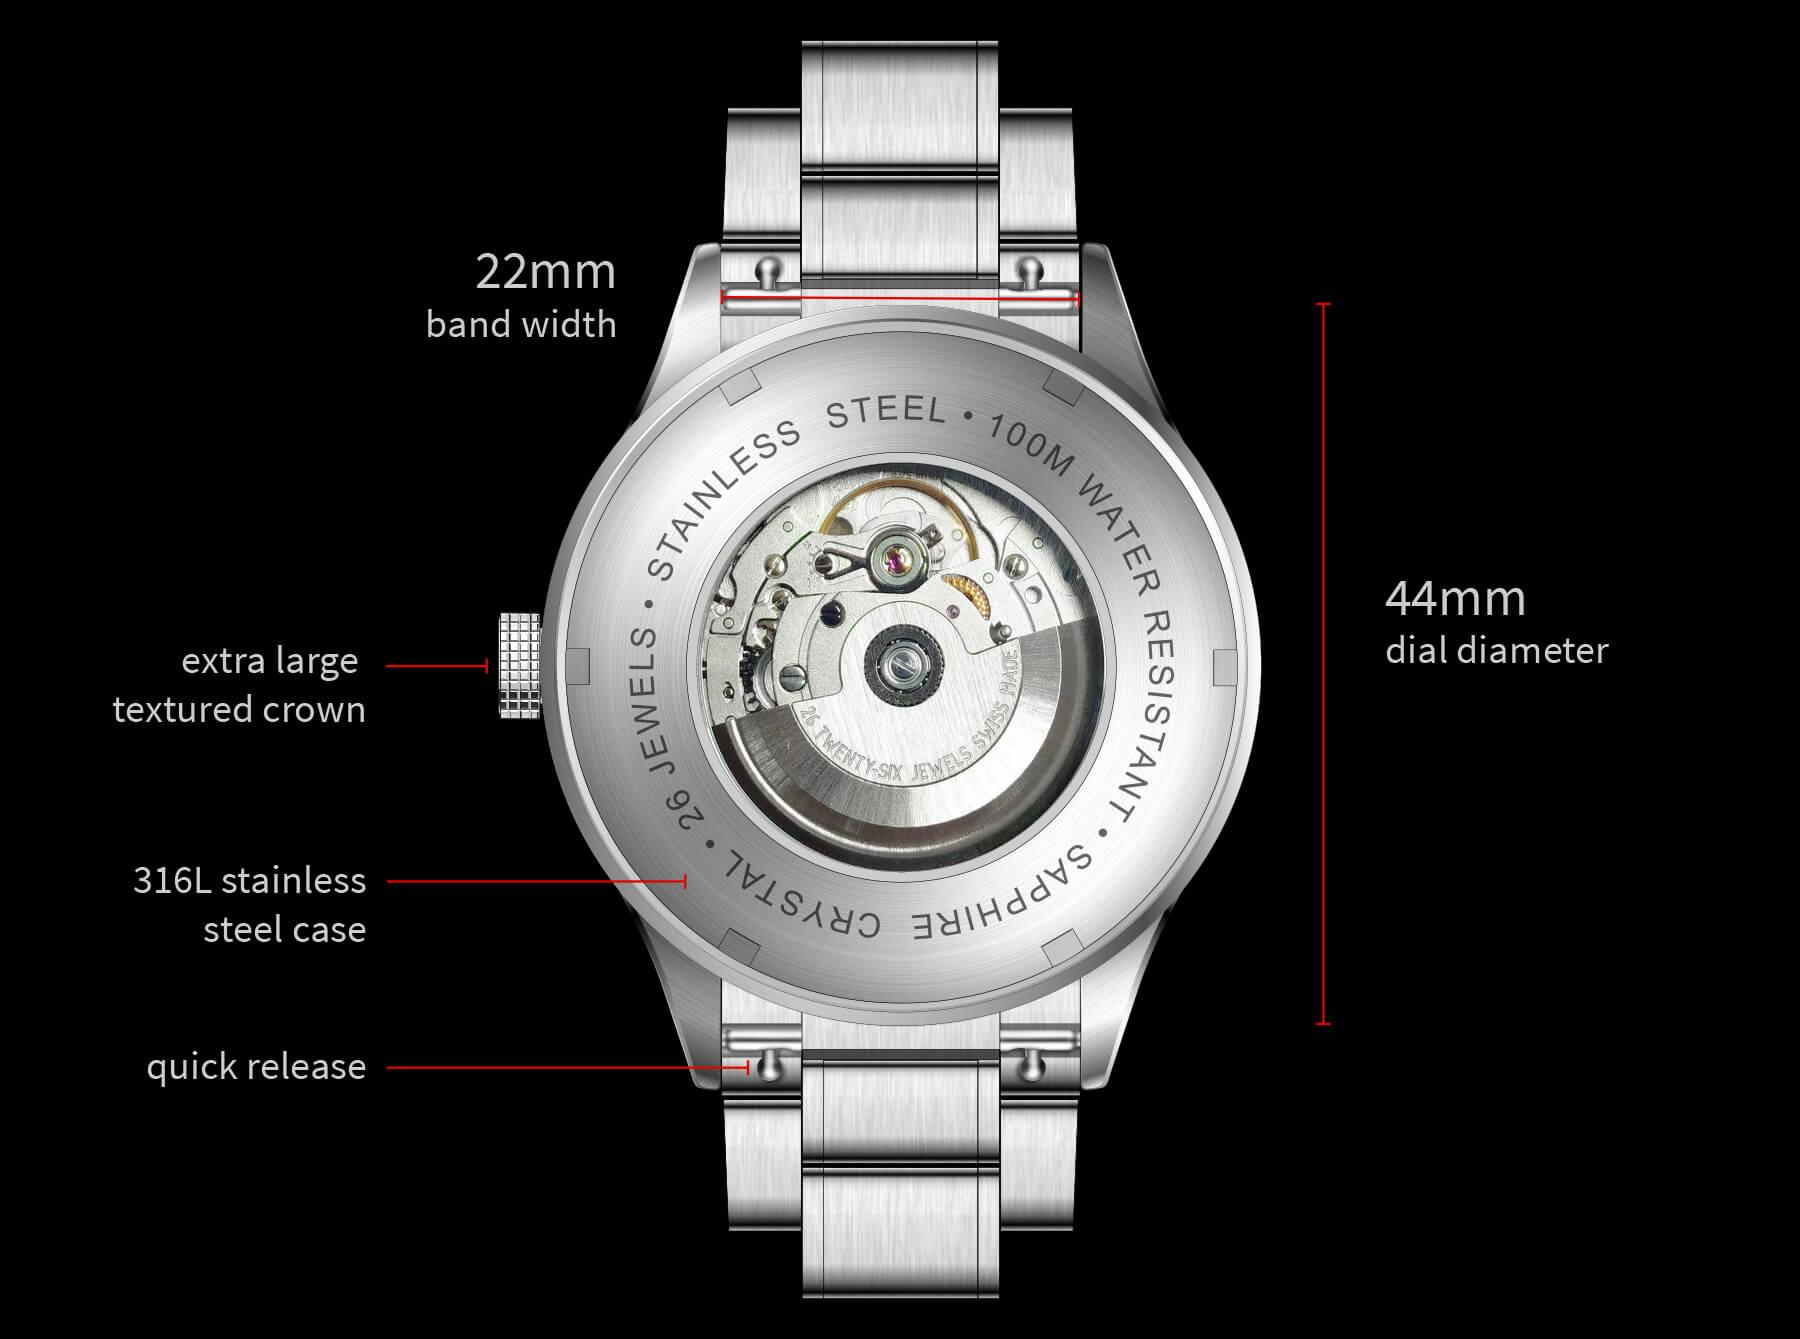 image of watch specs